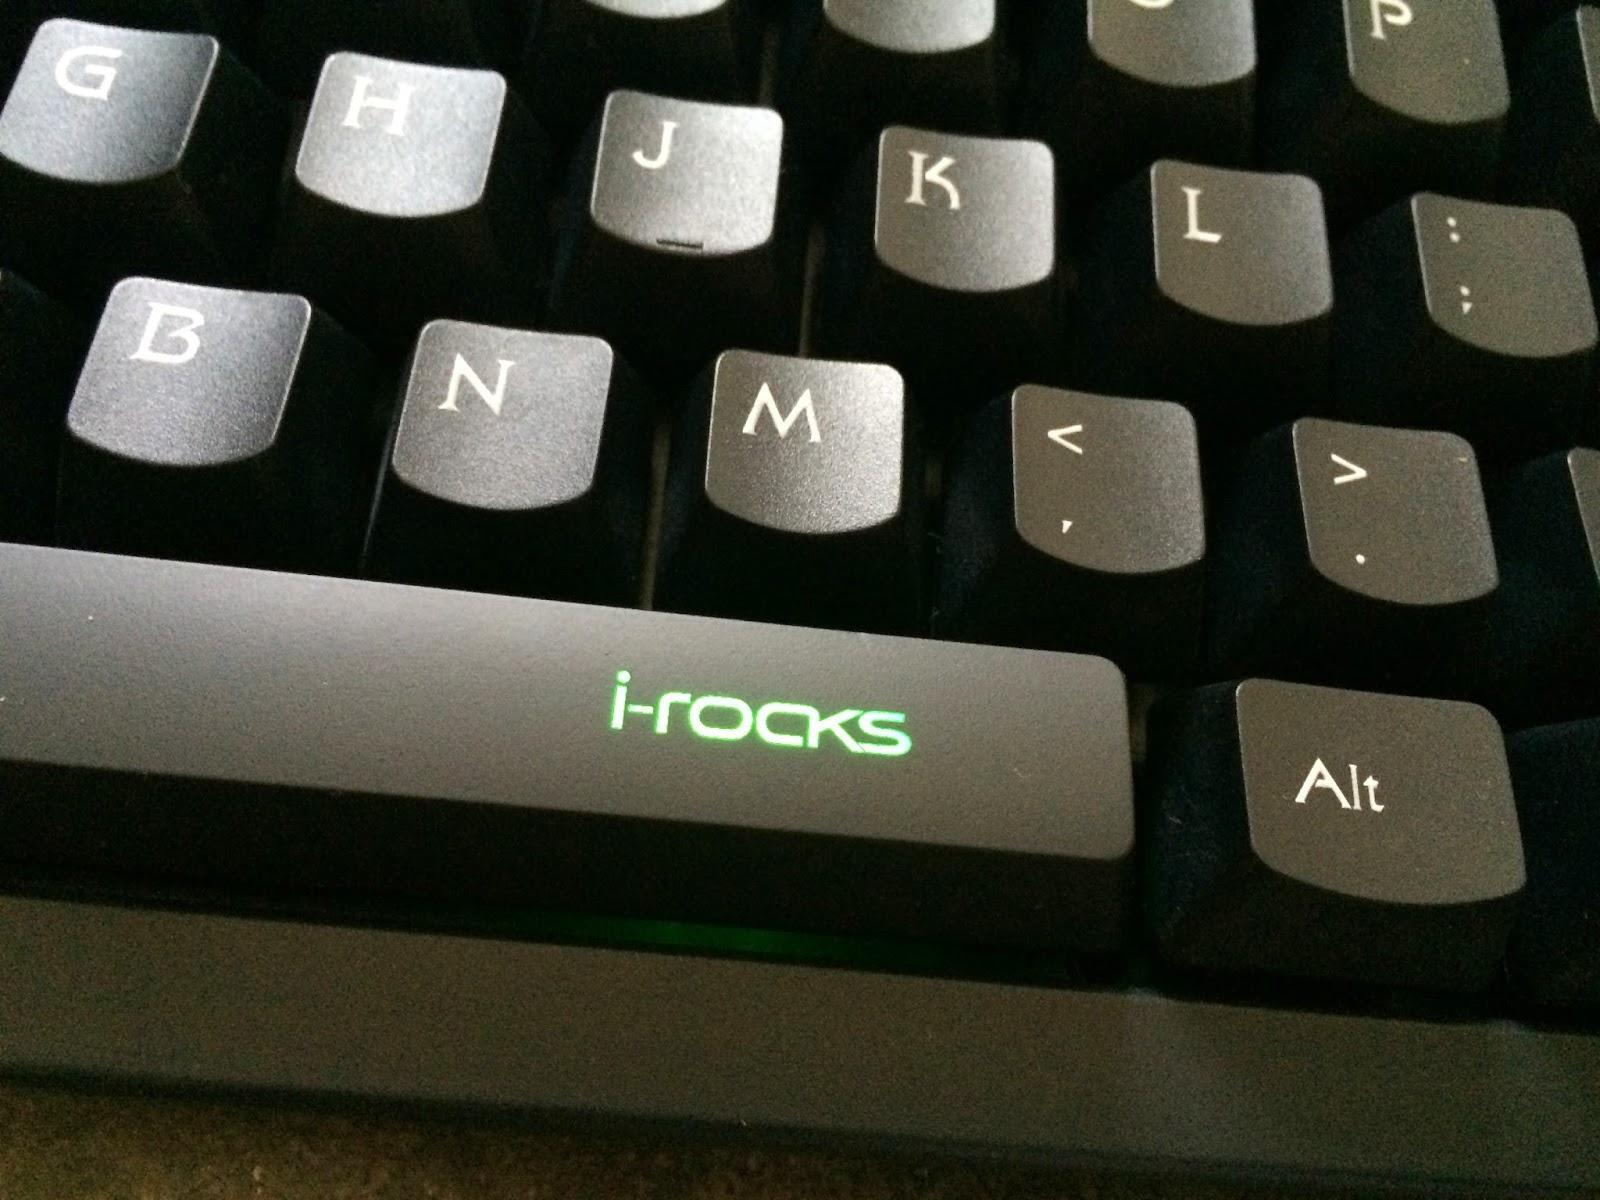 Unboxing & Review: i-Rocks K10 Gaming Keyboard 68